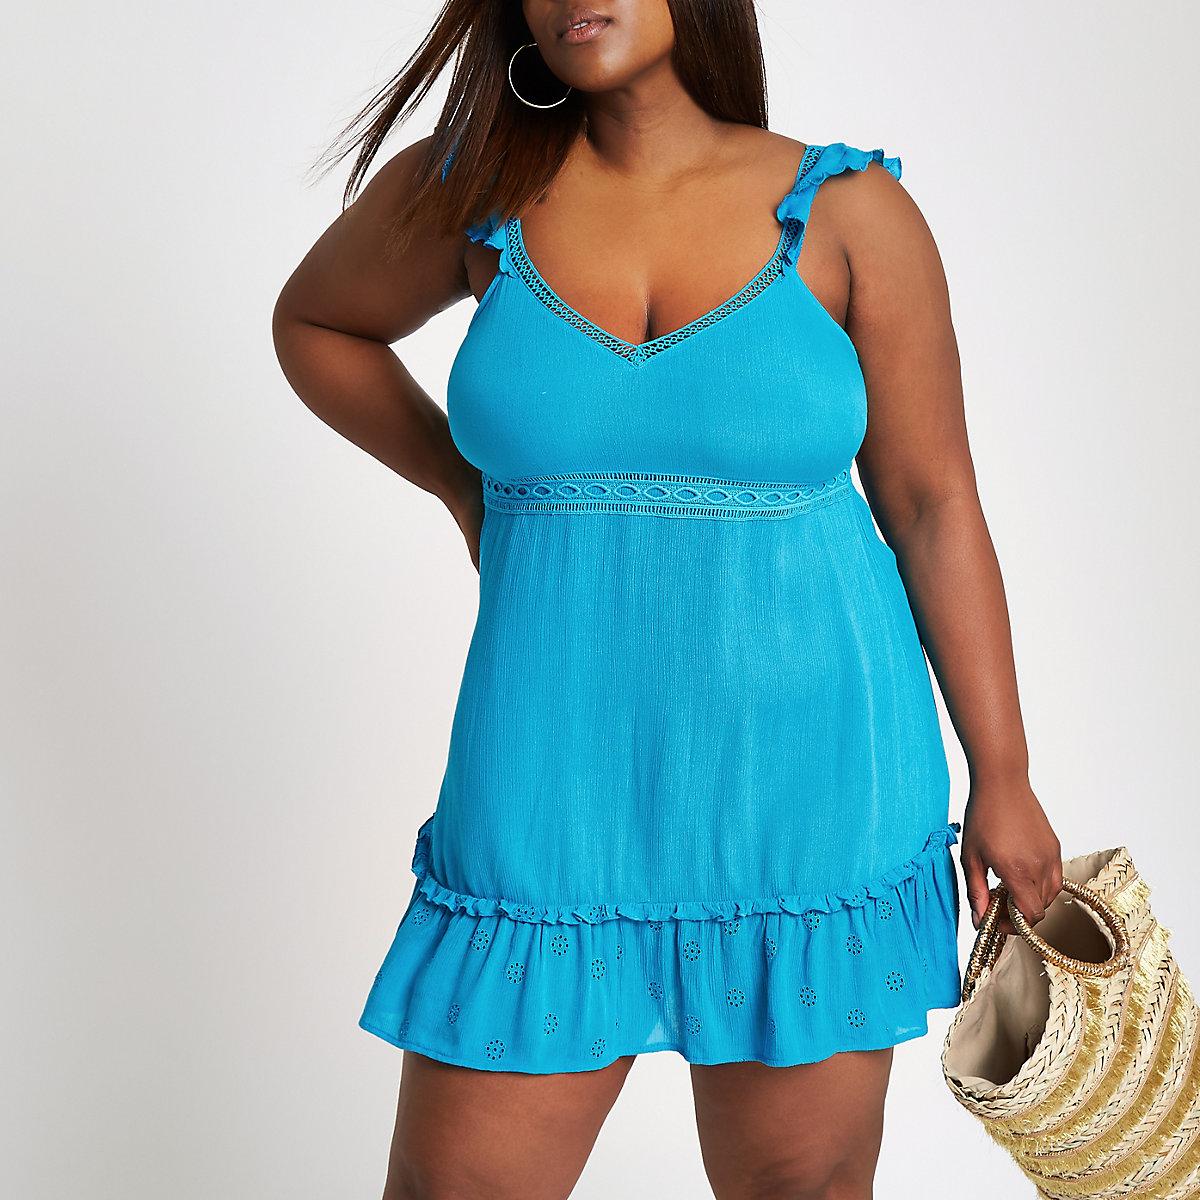 Plus blue bow cut out back cover up - Kaftans   Beach Cover-Ups - Swimwear    Beachwear - women bee9dc8d56886